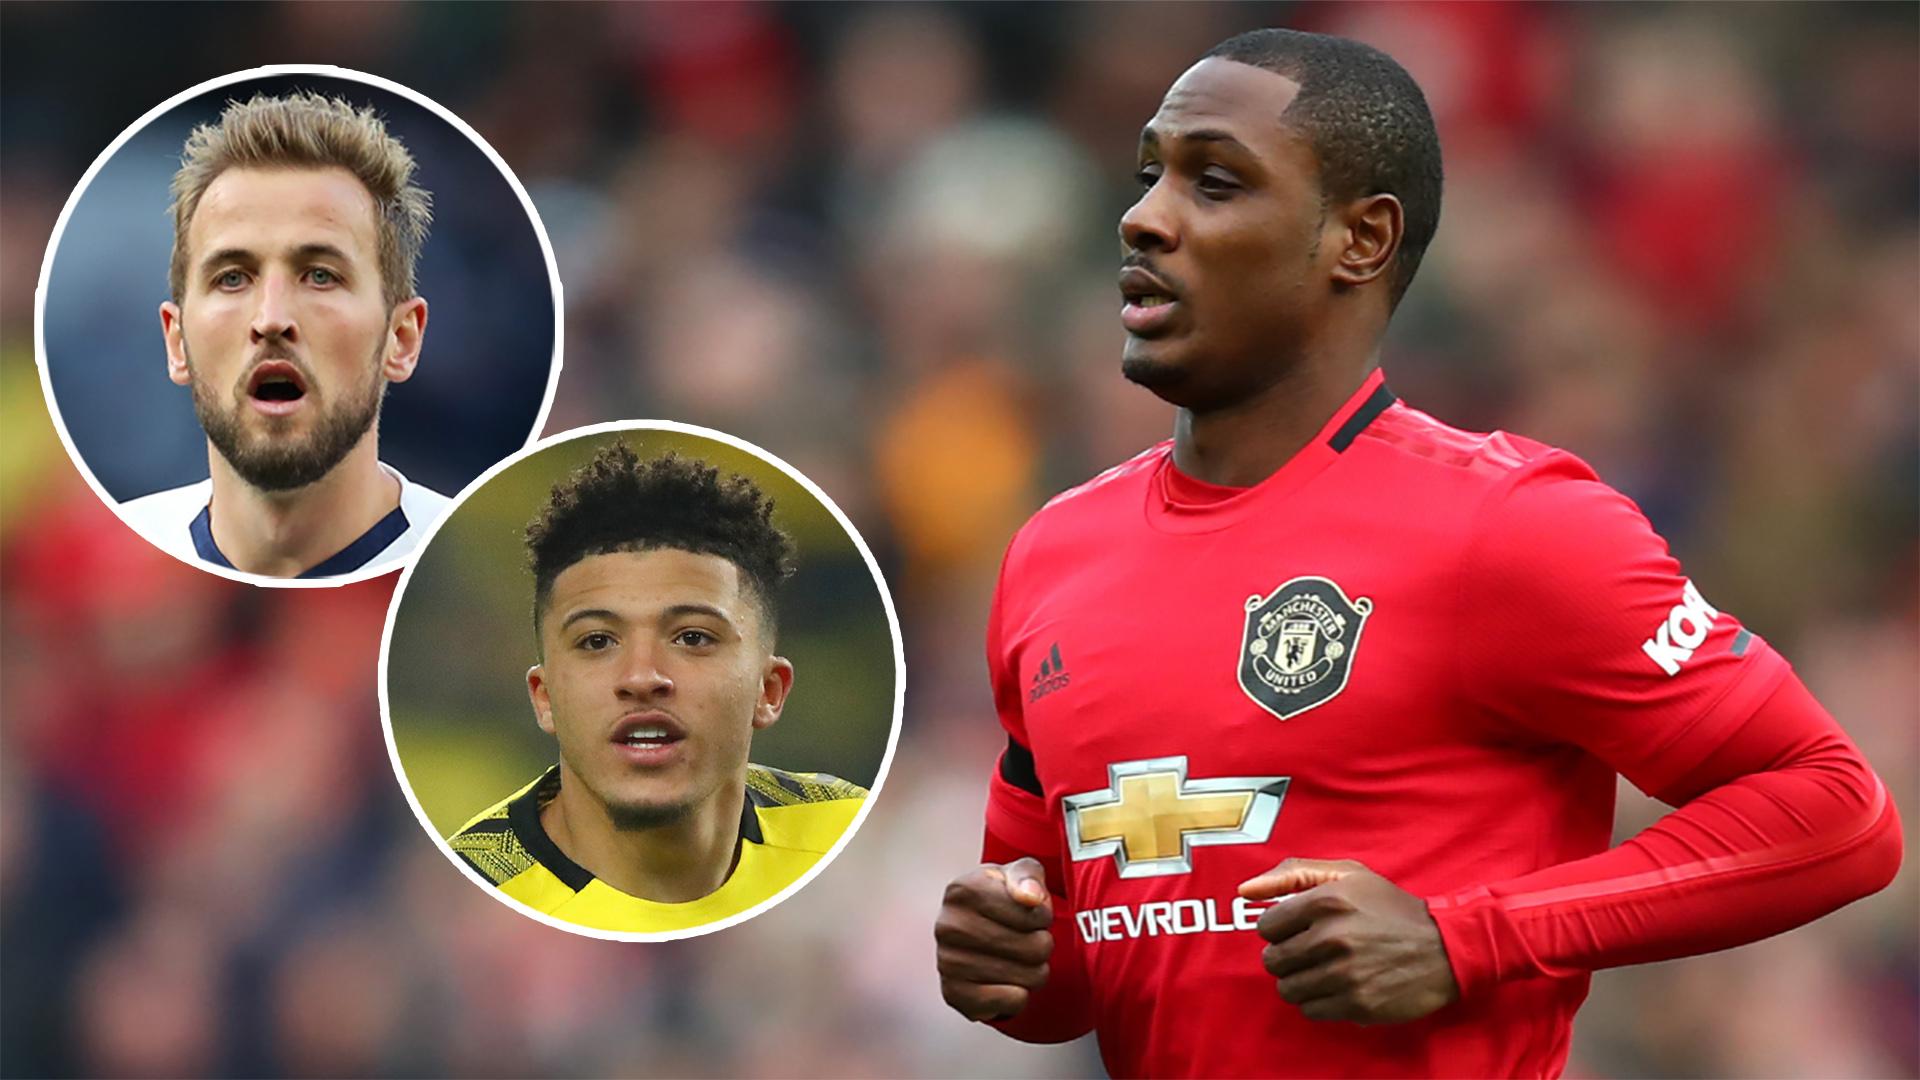 If Man Utd move for Kane & Sancho they won't need Ighalo - Berbatov